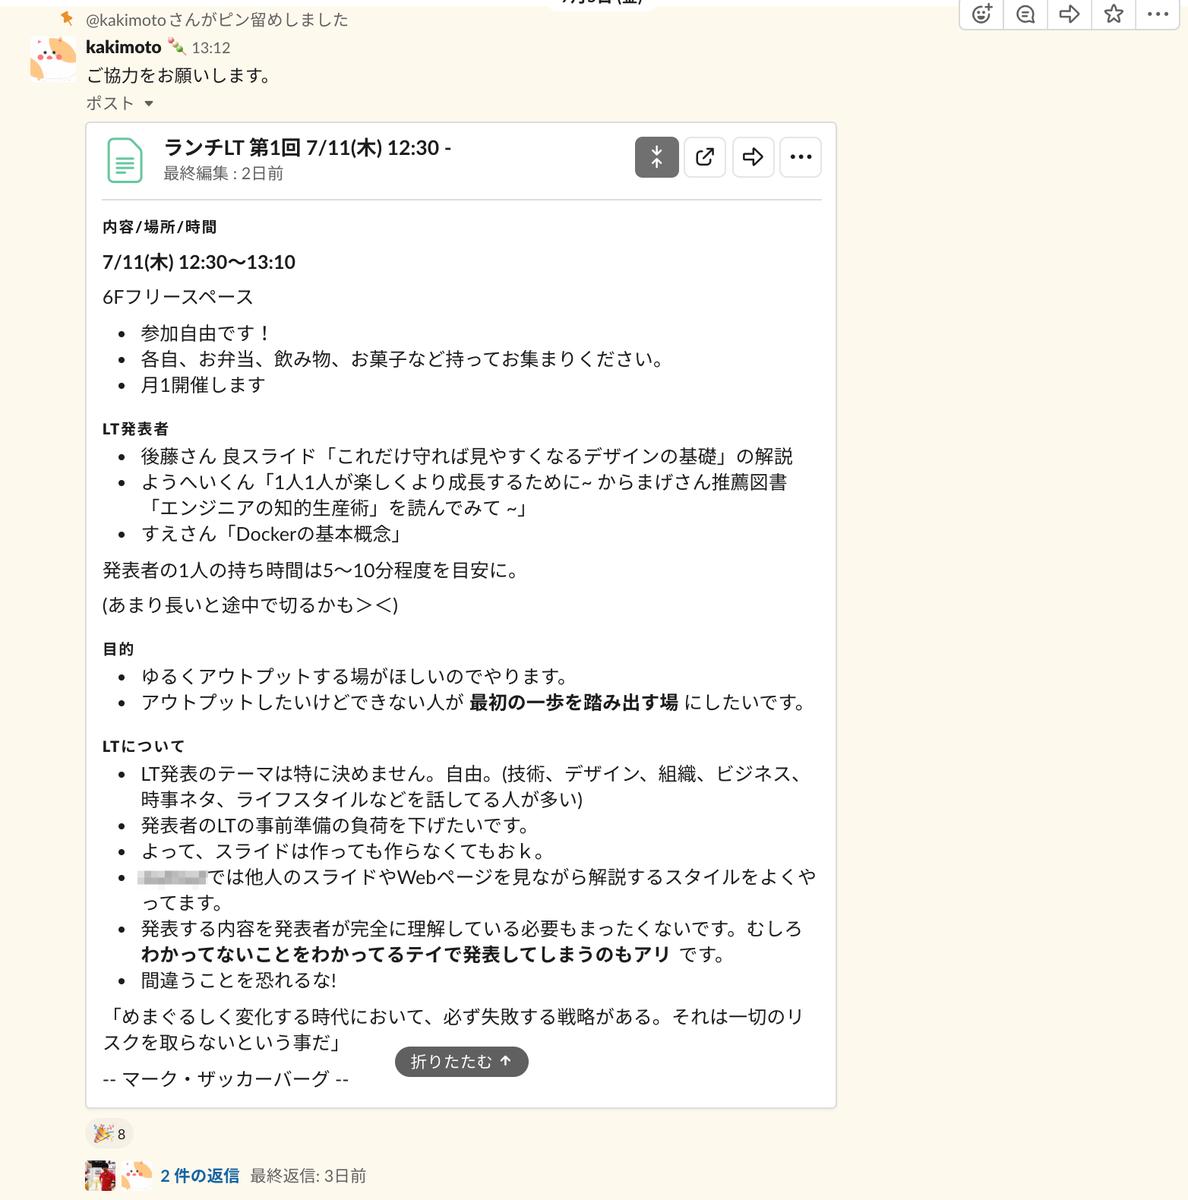 f:id:yohei-fujii:20190711201019p:plain